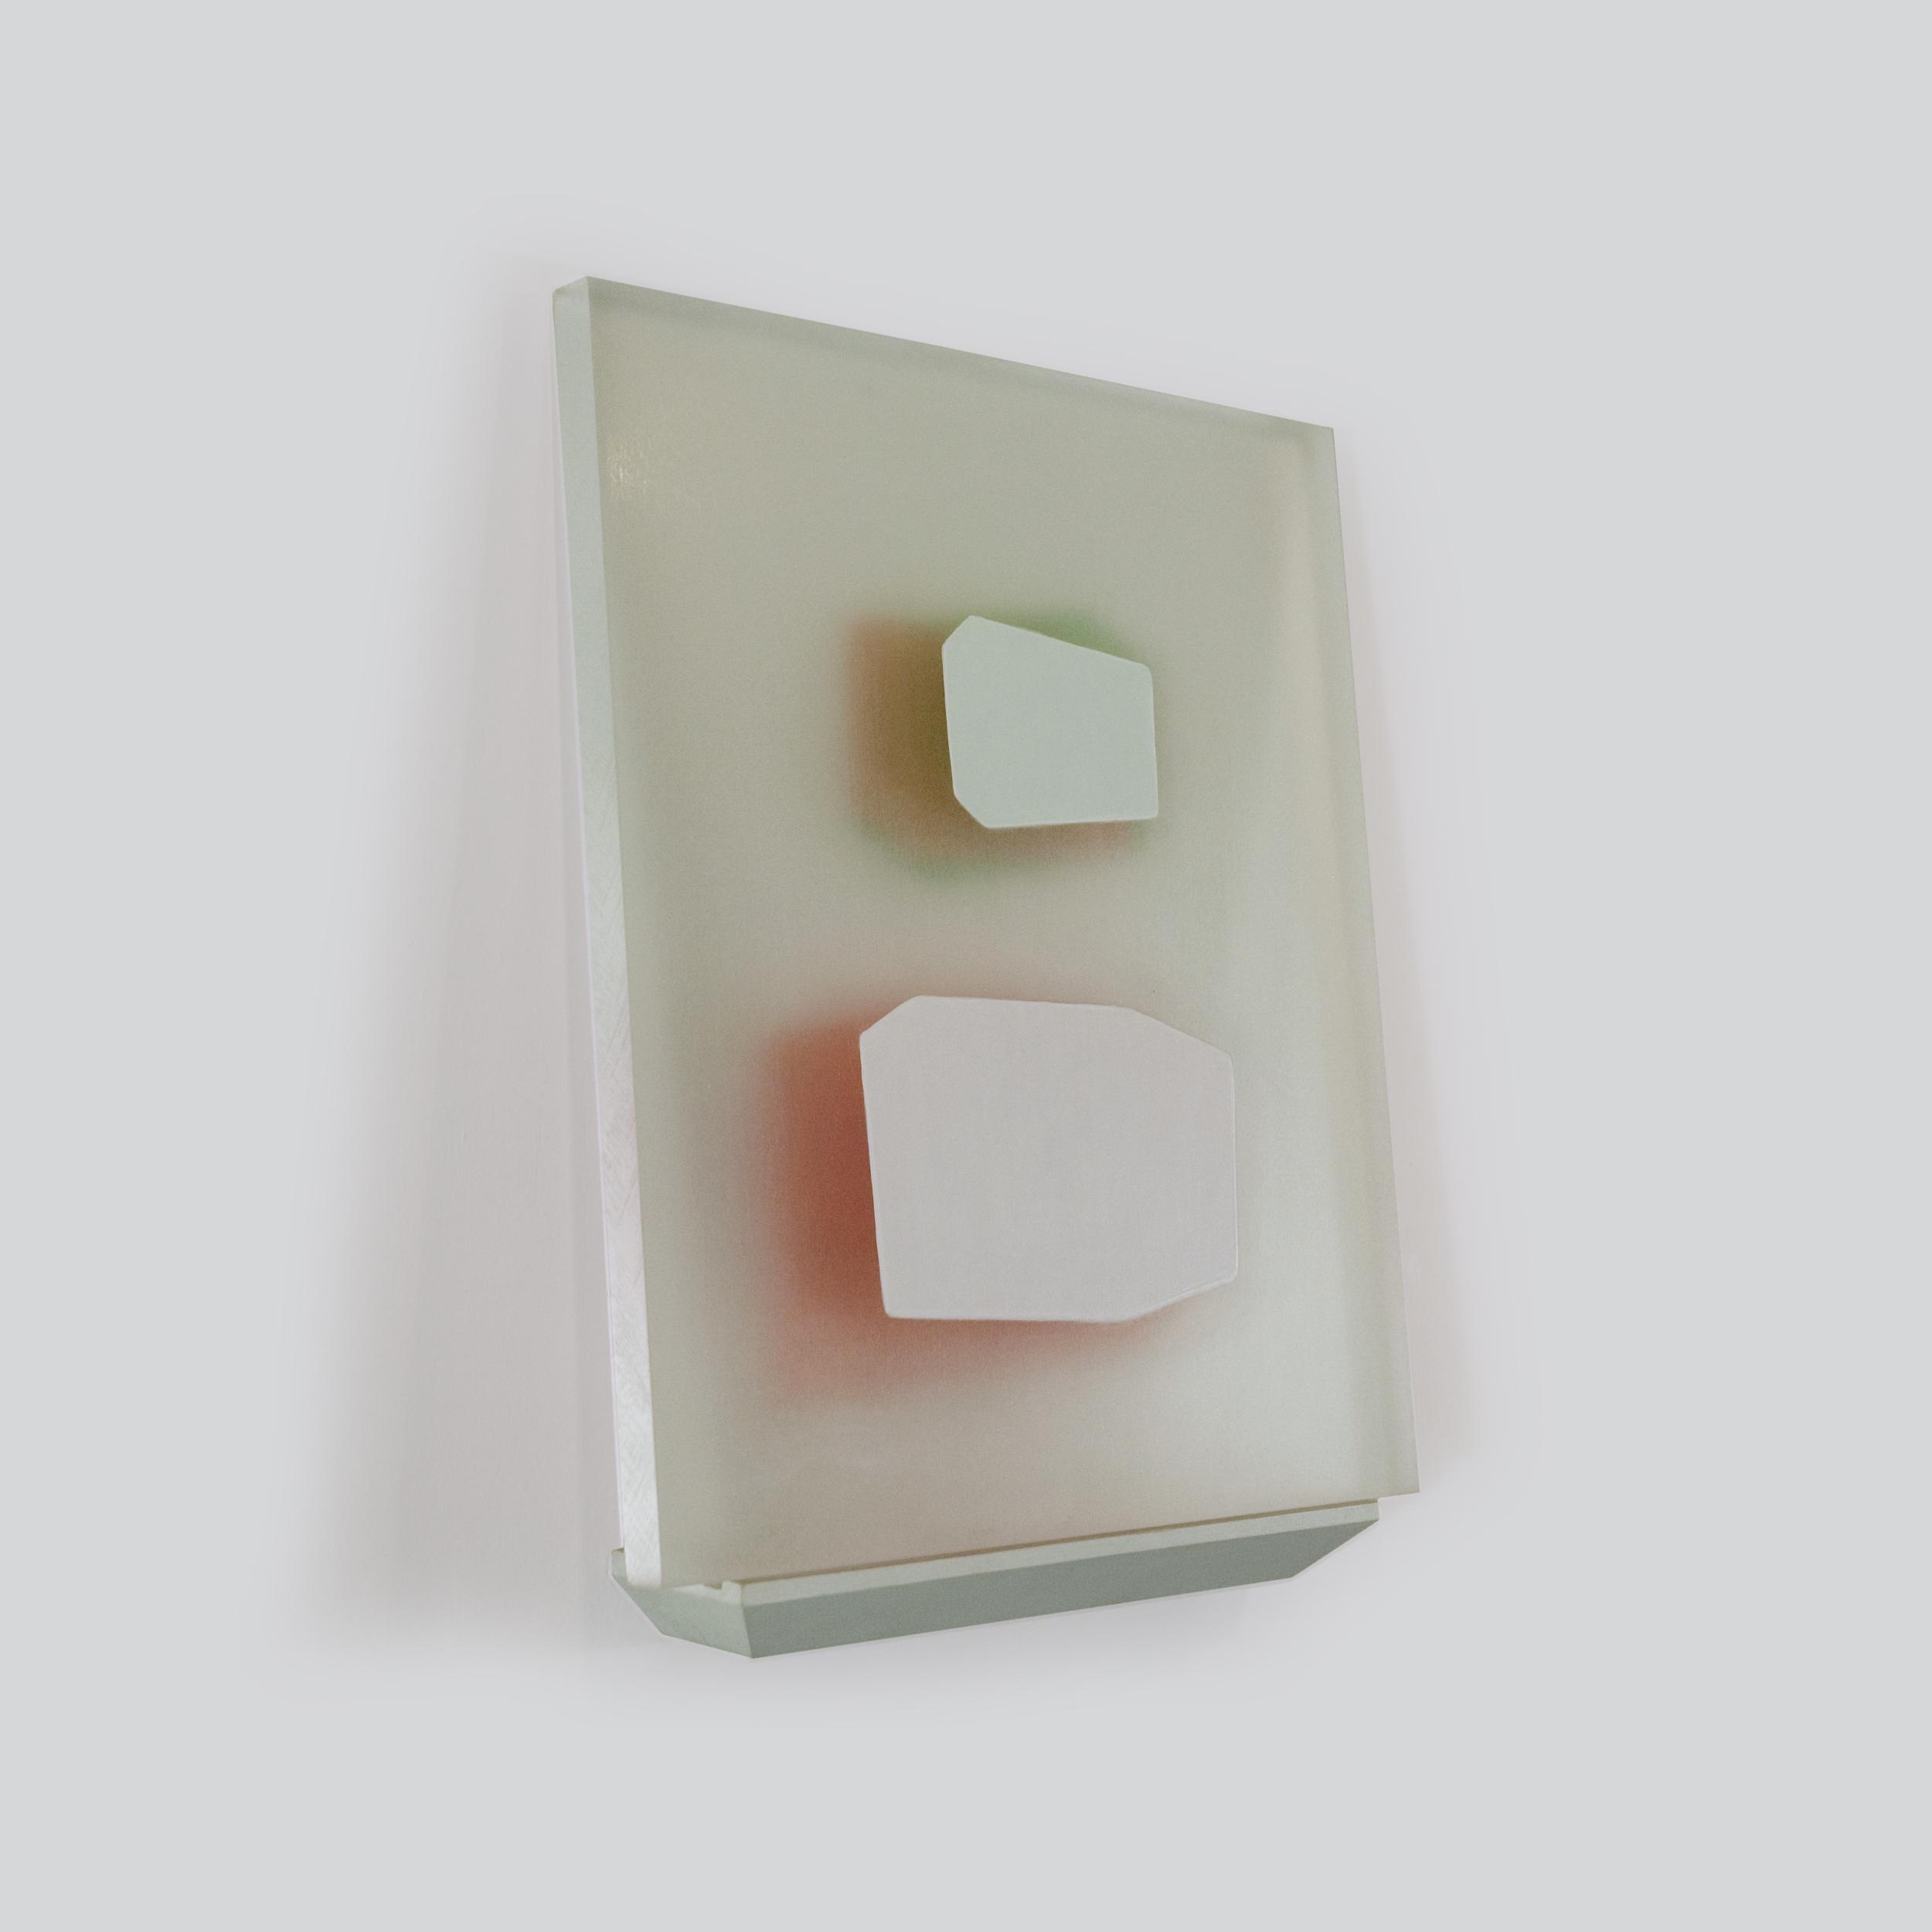 Ruse of Transparency 13     2009     acrylic on plexiglass, shelf     17 x 13 inches